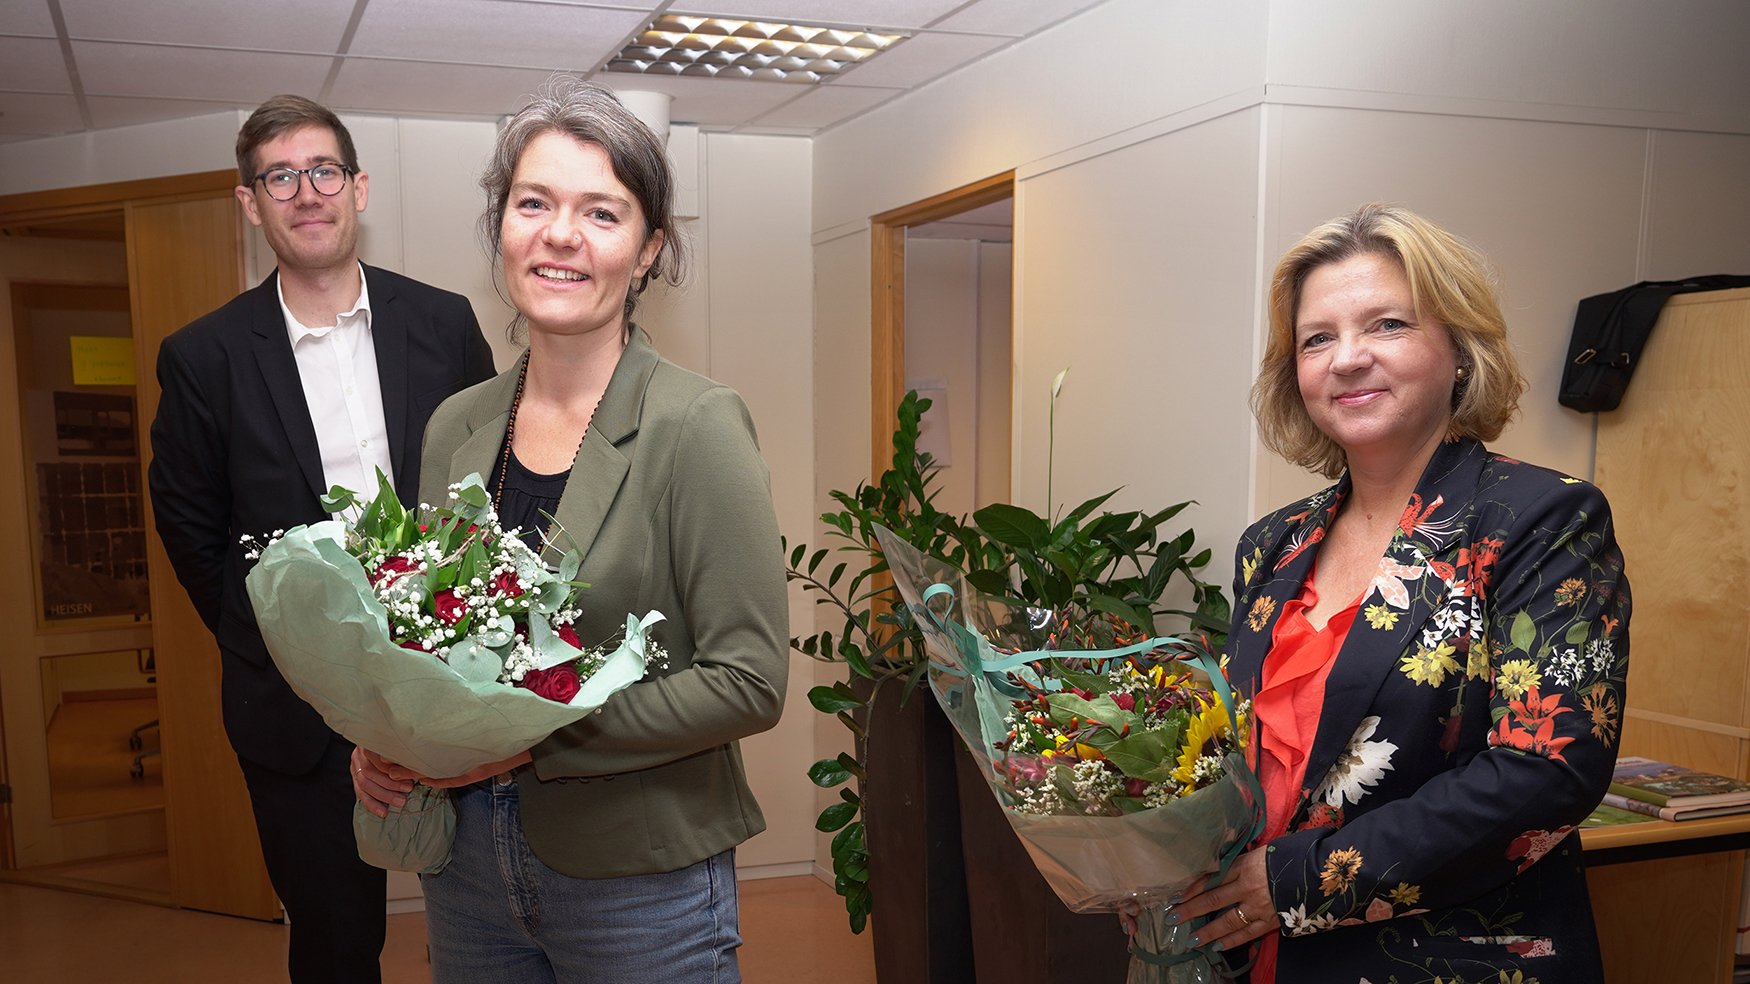 hor Haakon Bakke, byråd for klima, miljø og byutvikling, klimadirektør Stina Ellevseth Oseland og Anne Iren Fagerbakke, kommunaldirektør i Byrådsavdeling for klima, miljø og byutvikling.